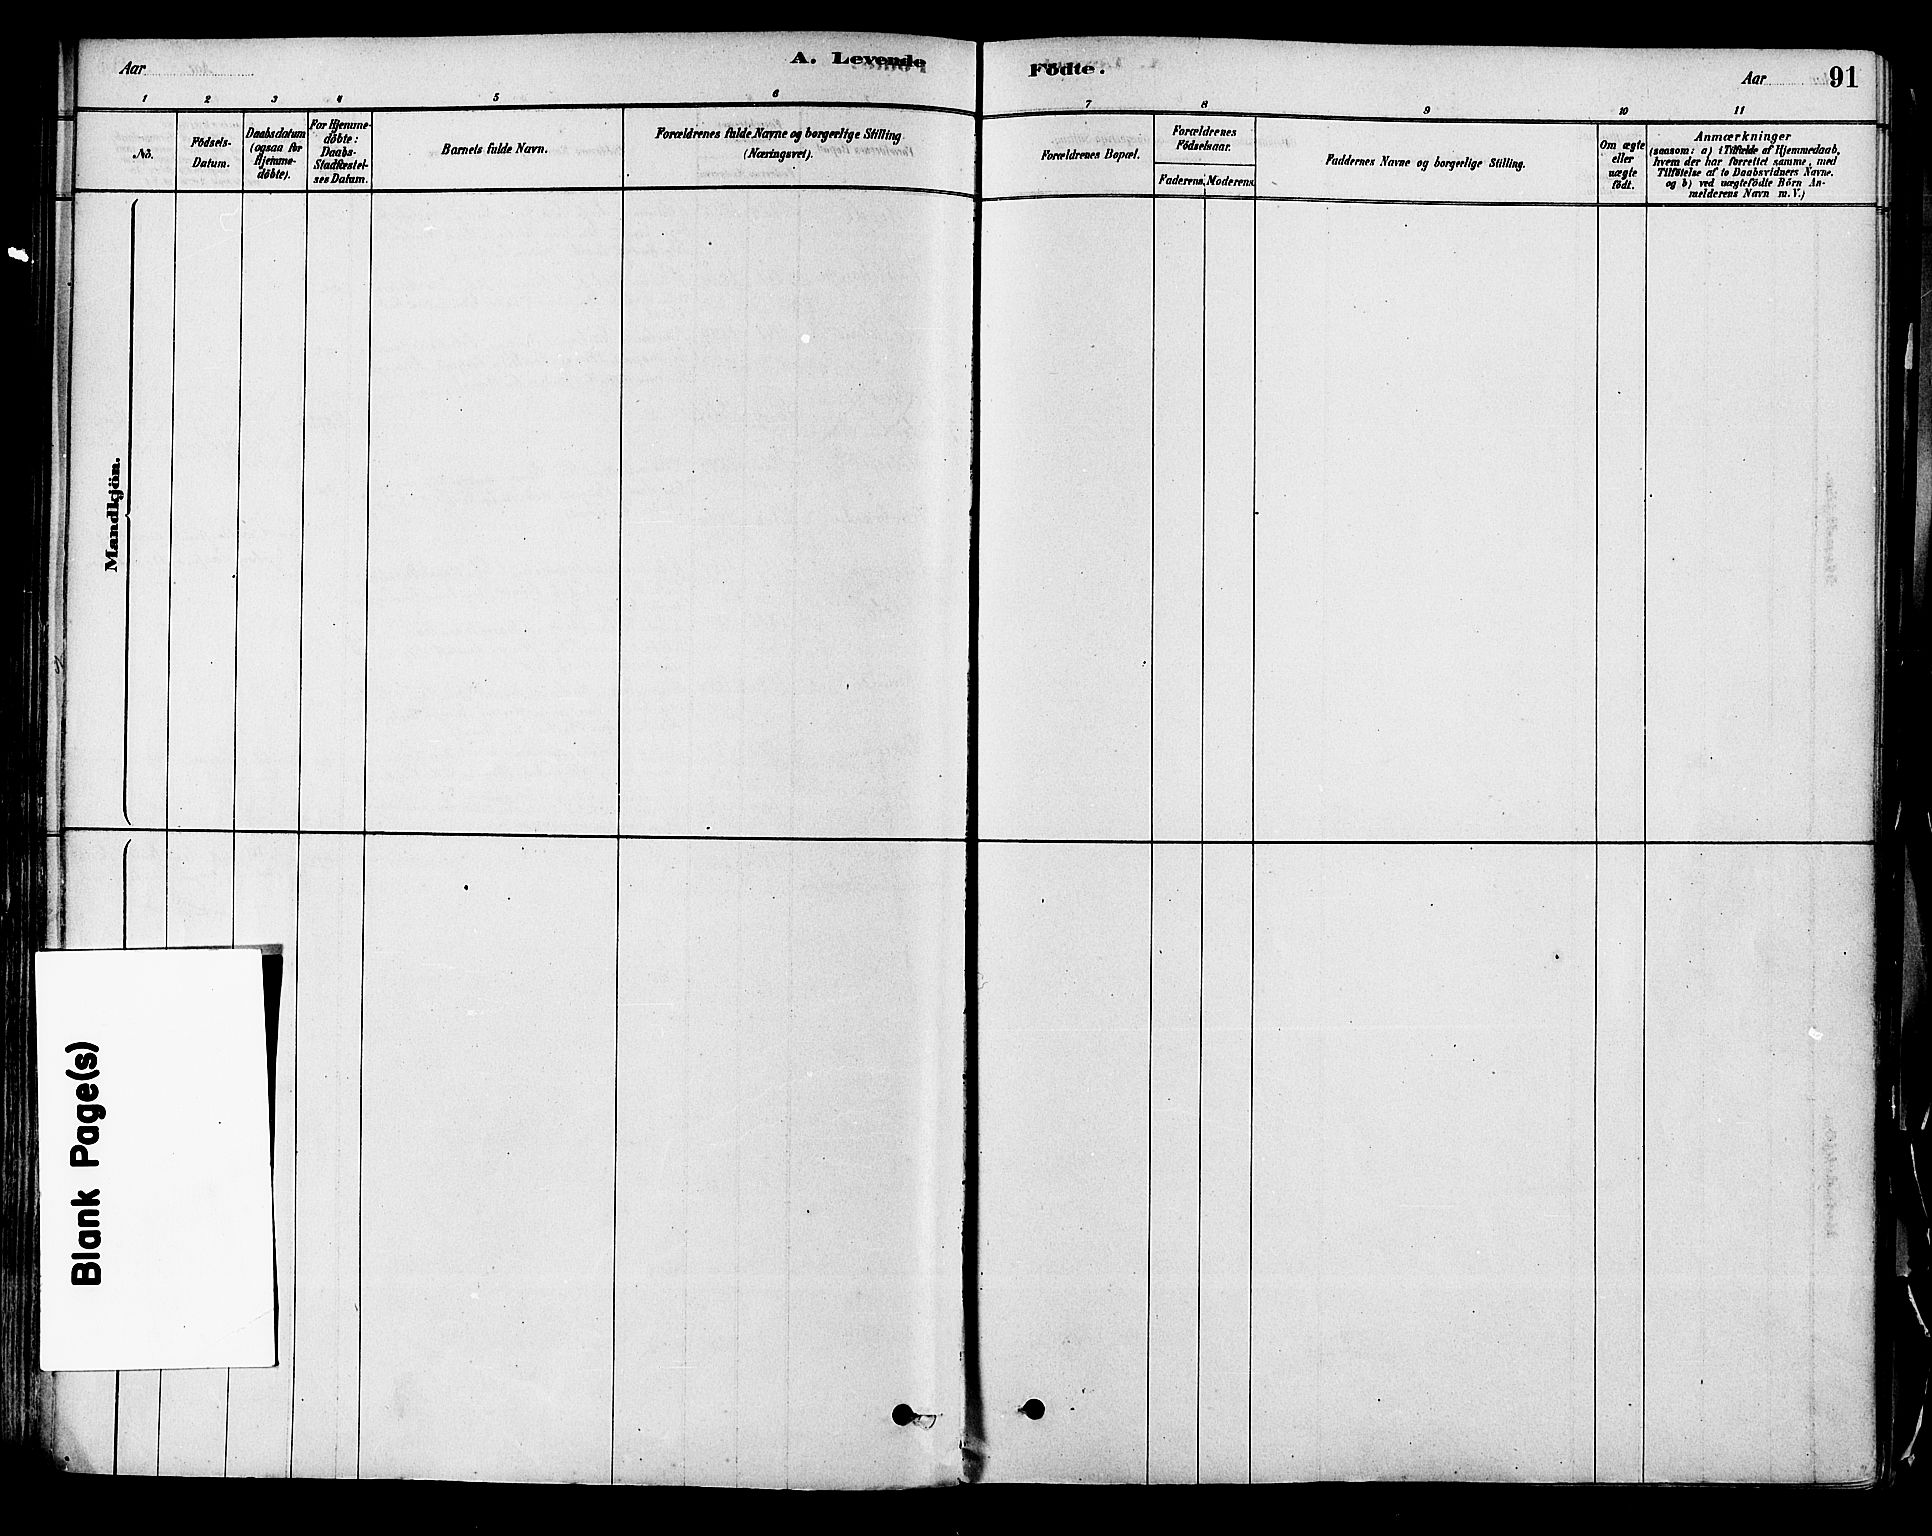 SAKO, Modum kirkebøker, F/Fa/L0011: Ministerialbok nr. 11, 1877-1889, s. 91